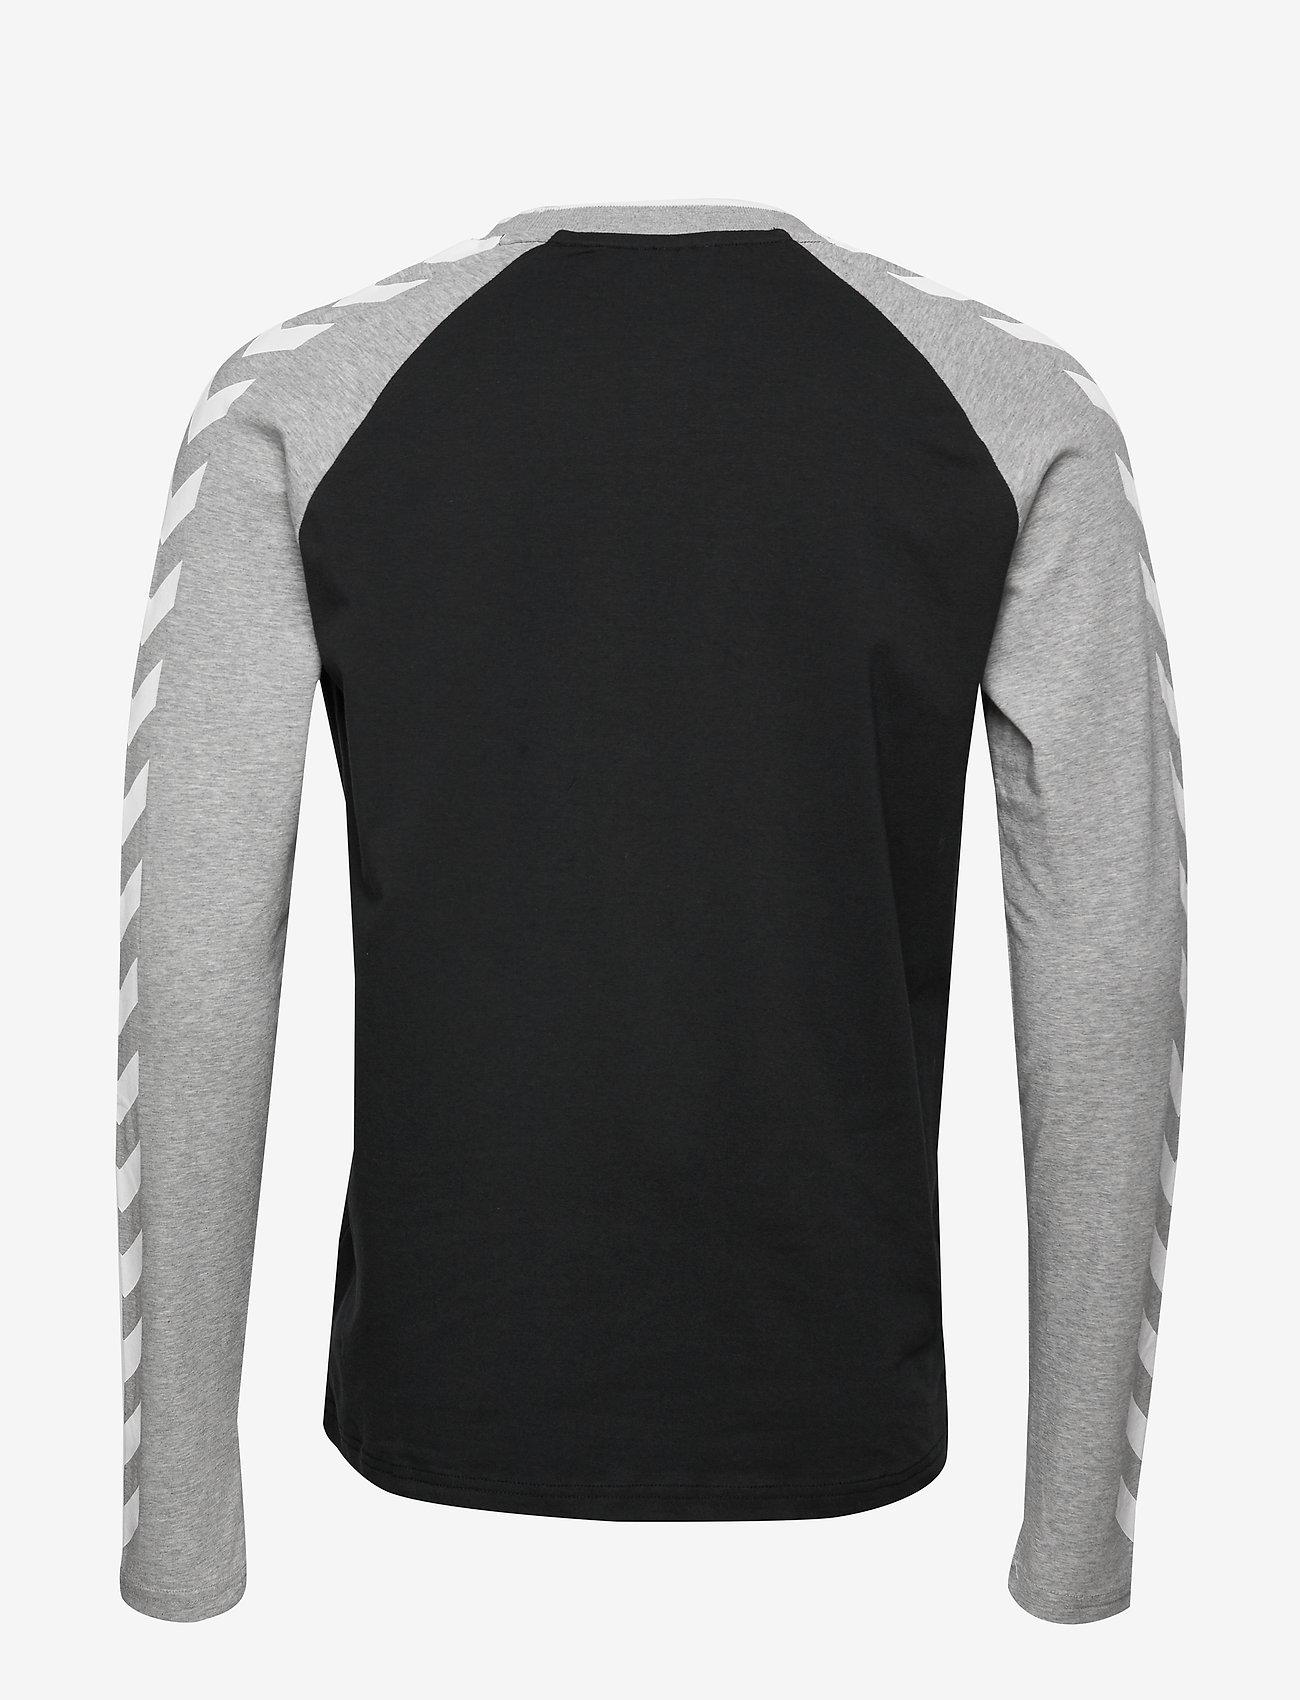 Hummel - hmlMARK T-SHIRT L/S - bluzki z długim rękawem - black - 1